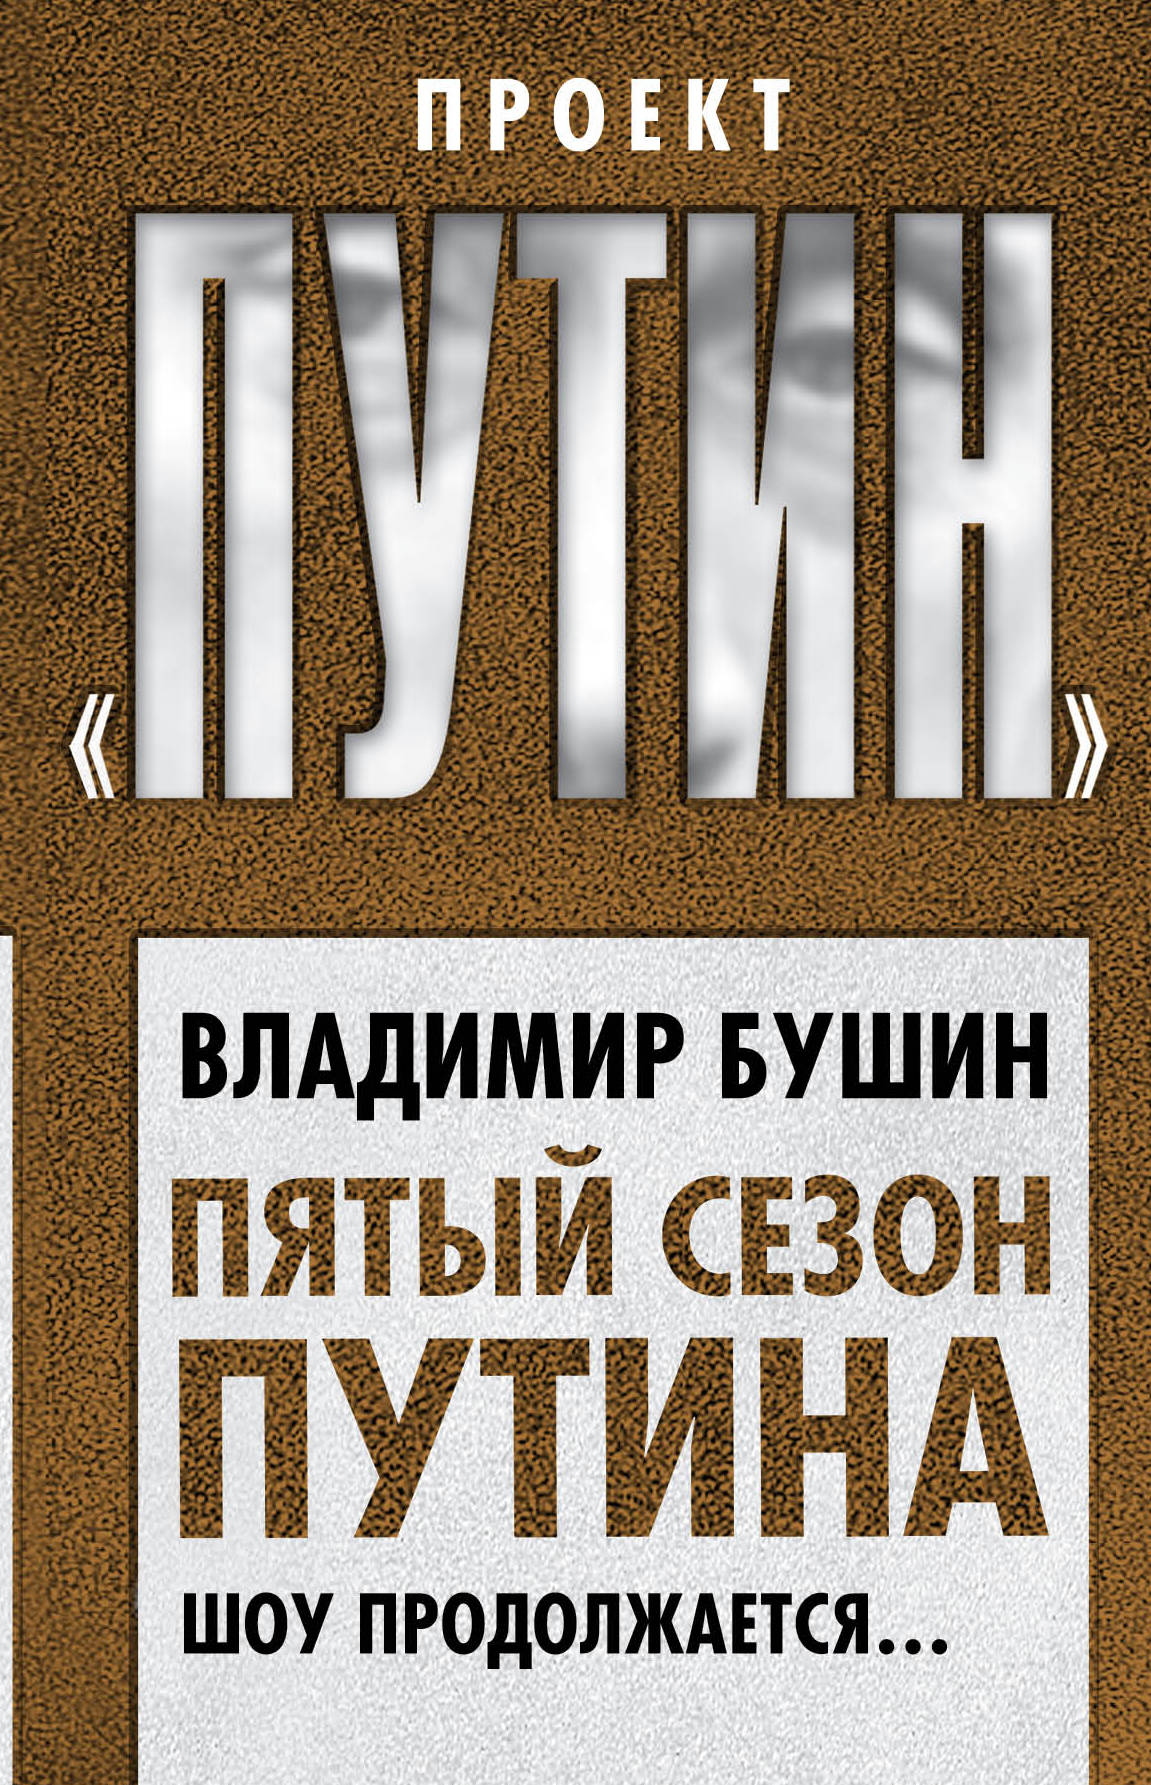 Владимир Бушин Пятый сезон Путина. Шоу продолжается…